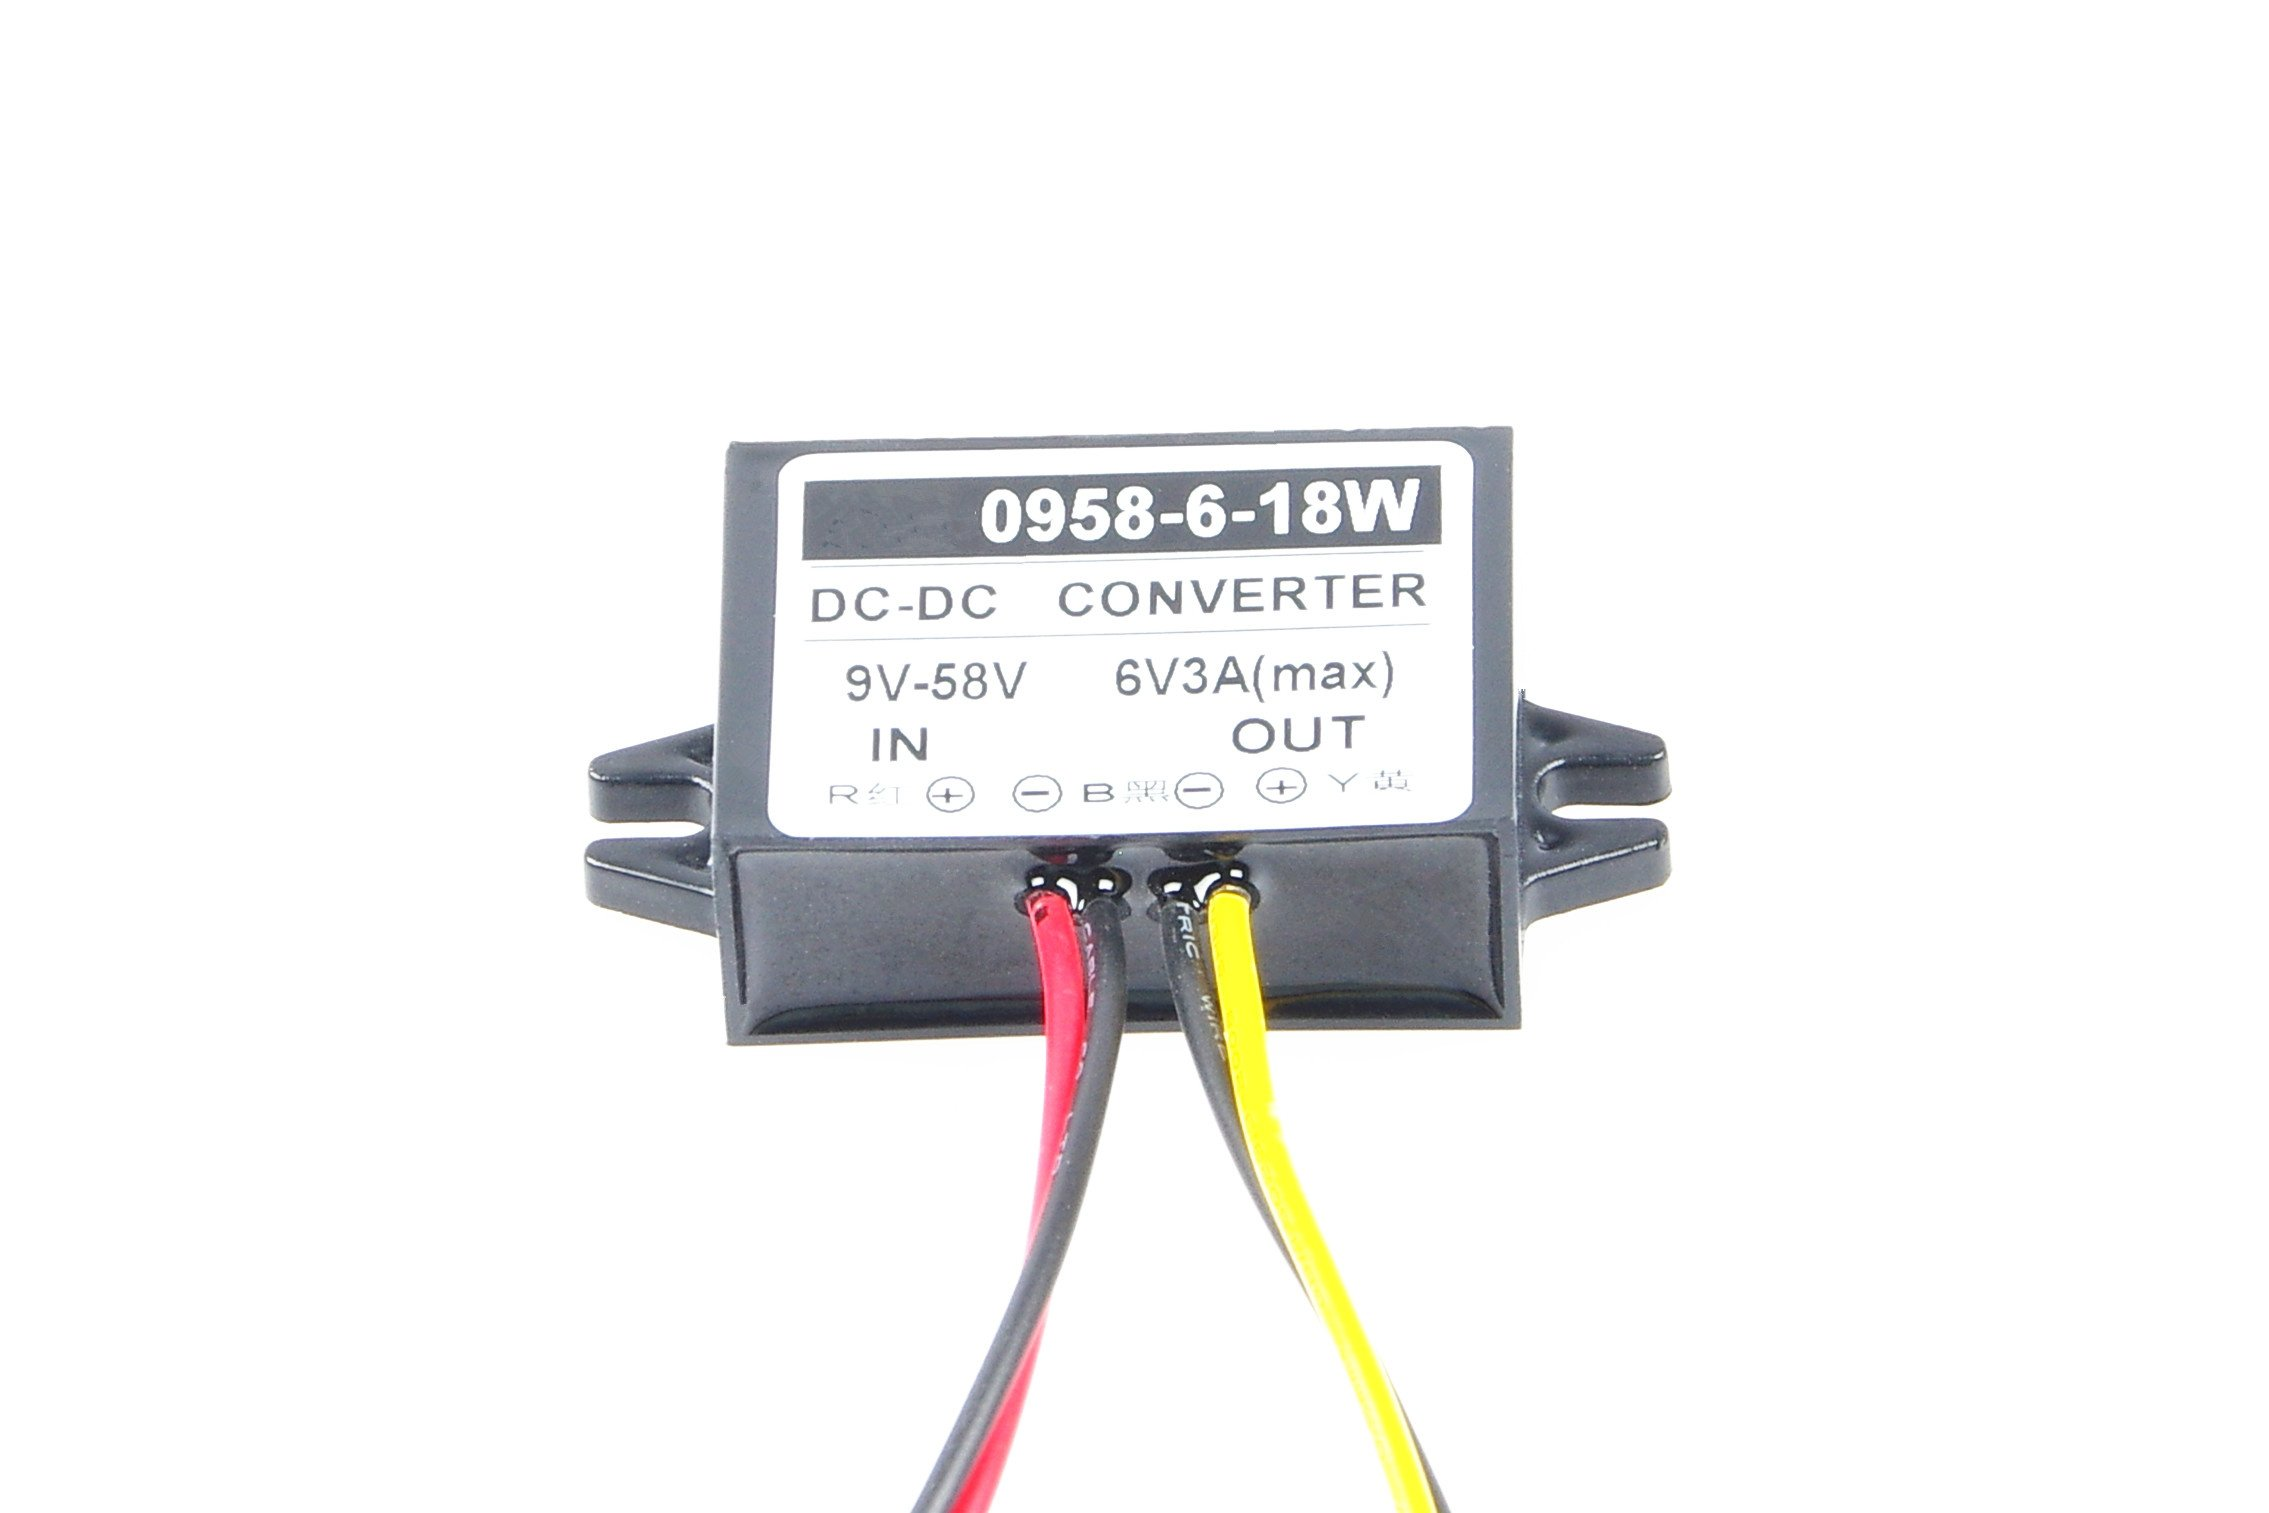 KNACRO Buck Boltage Converters 12V 24V 36V 48V (9V-58V) Changes to 6V 3A 18W Step Down car Power inverters Input DC 9V-58V Output 6V Waterproof Power adapters